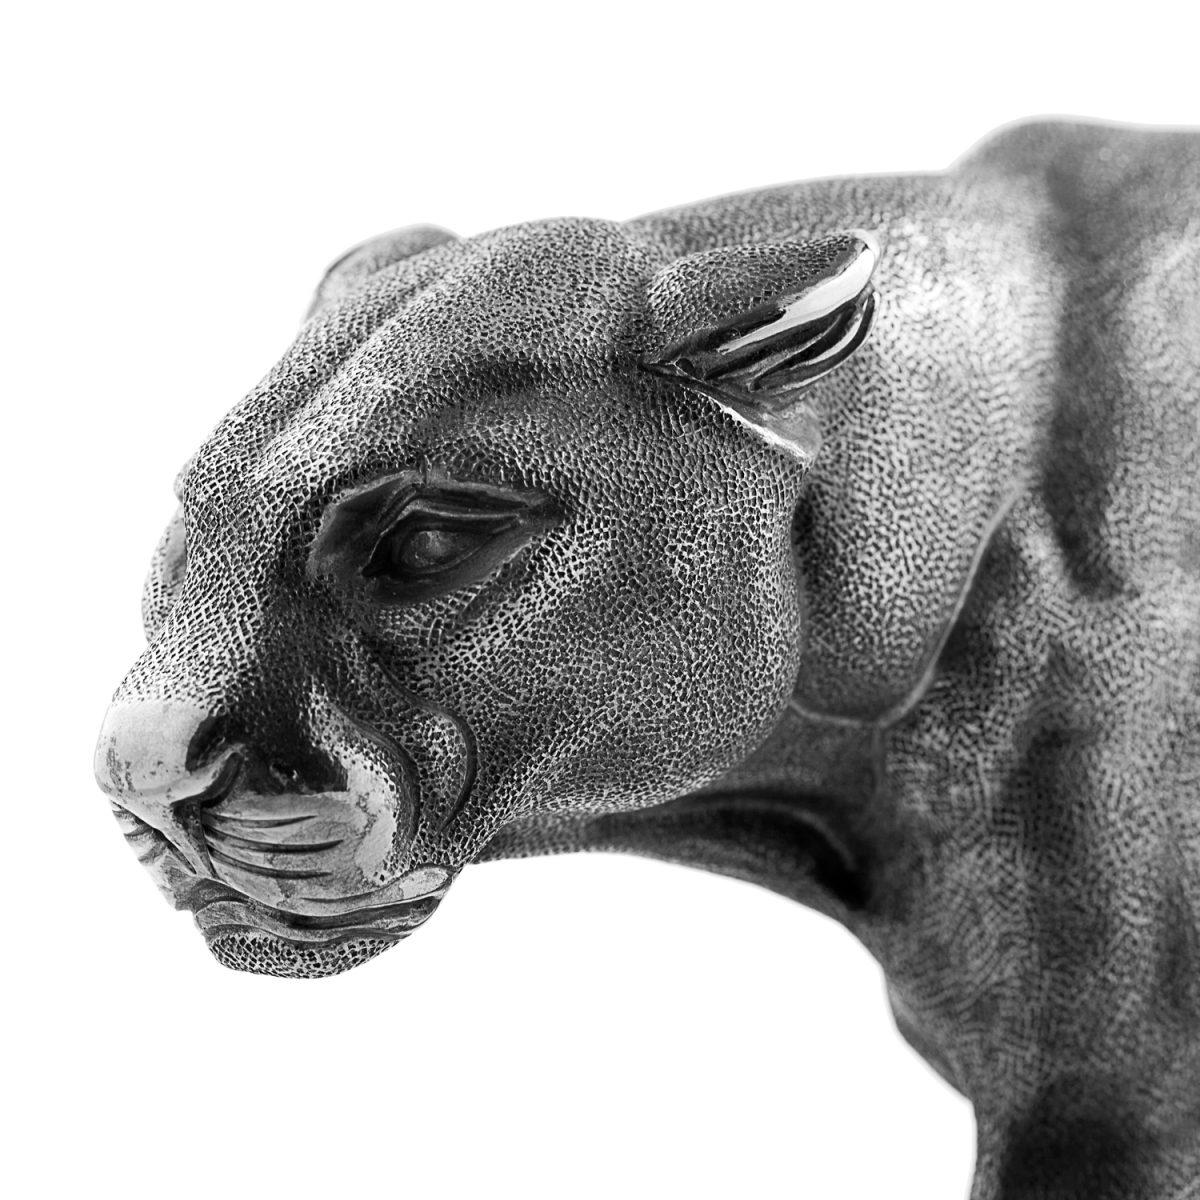 Panther head big cat